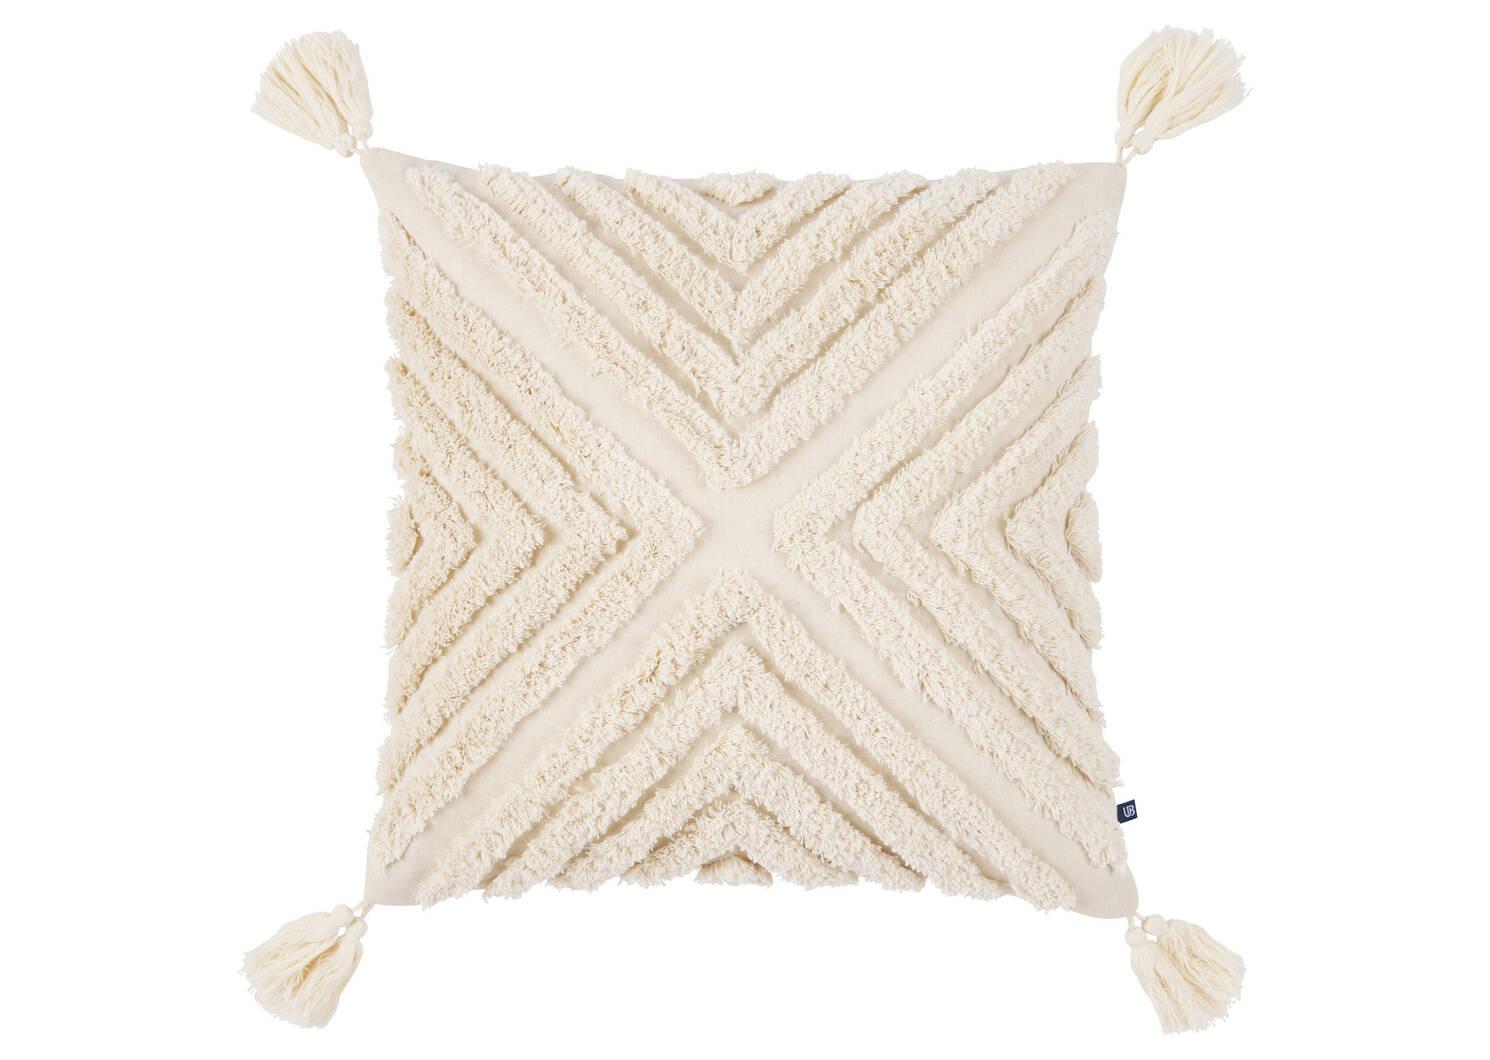 Dishani Toss 20x20 Sand/Ivory